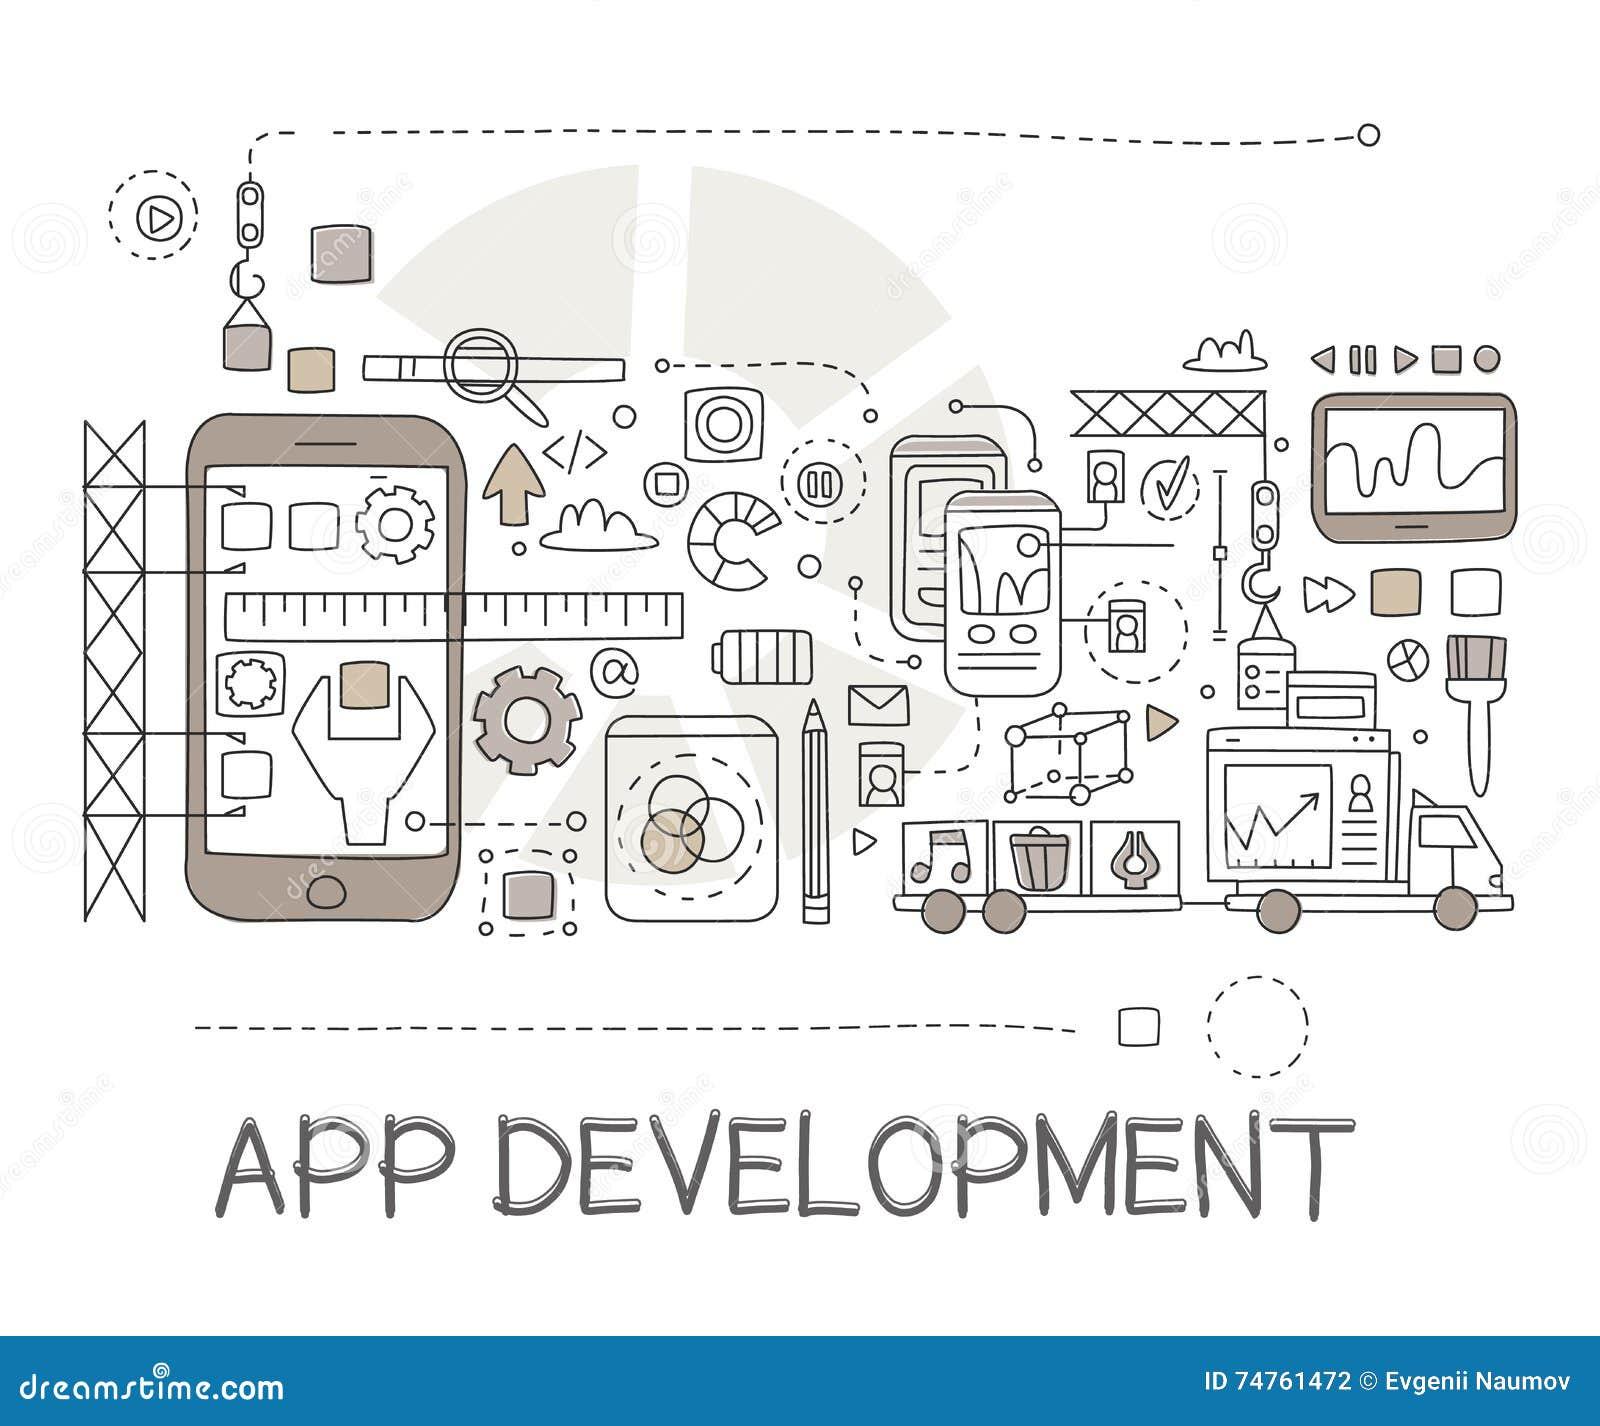 App development process elements creative sketch infographic stock app development process elements creative sketch infographic ccuart Image collections